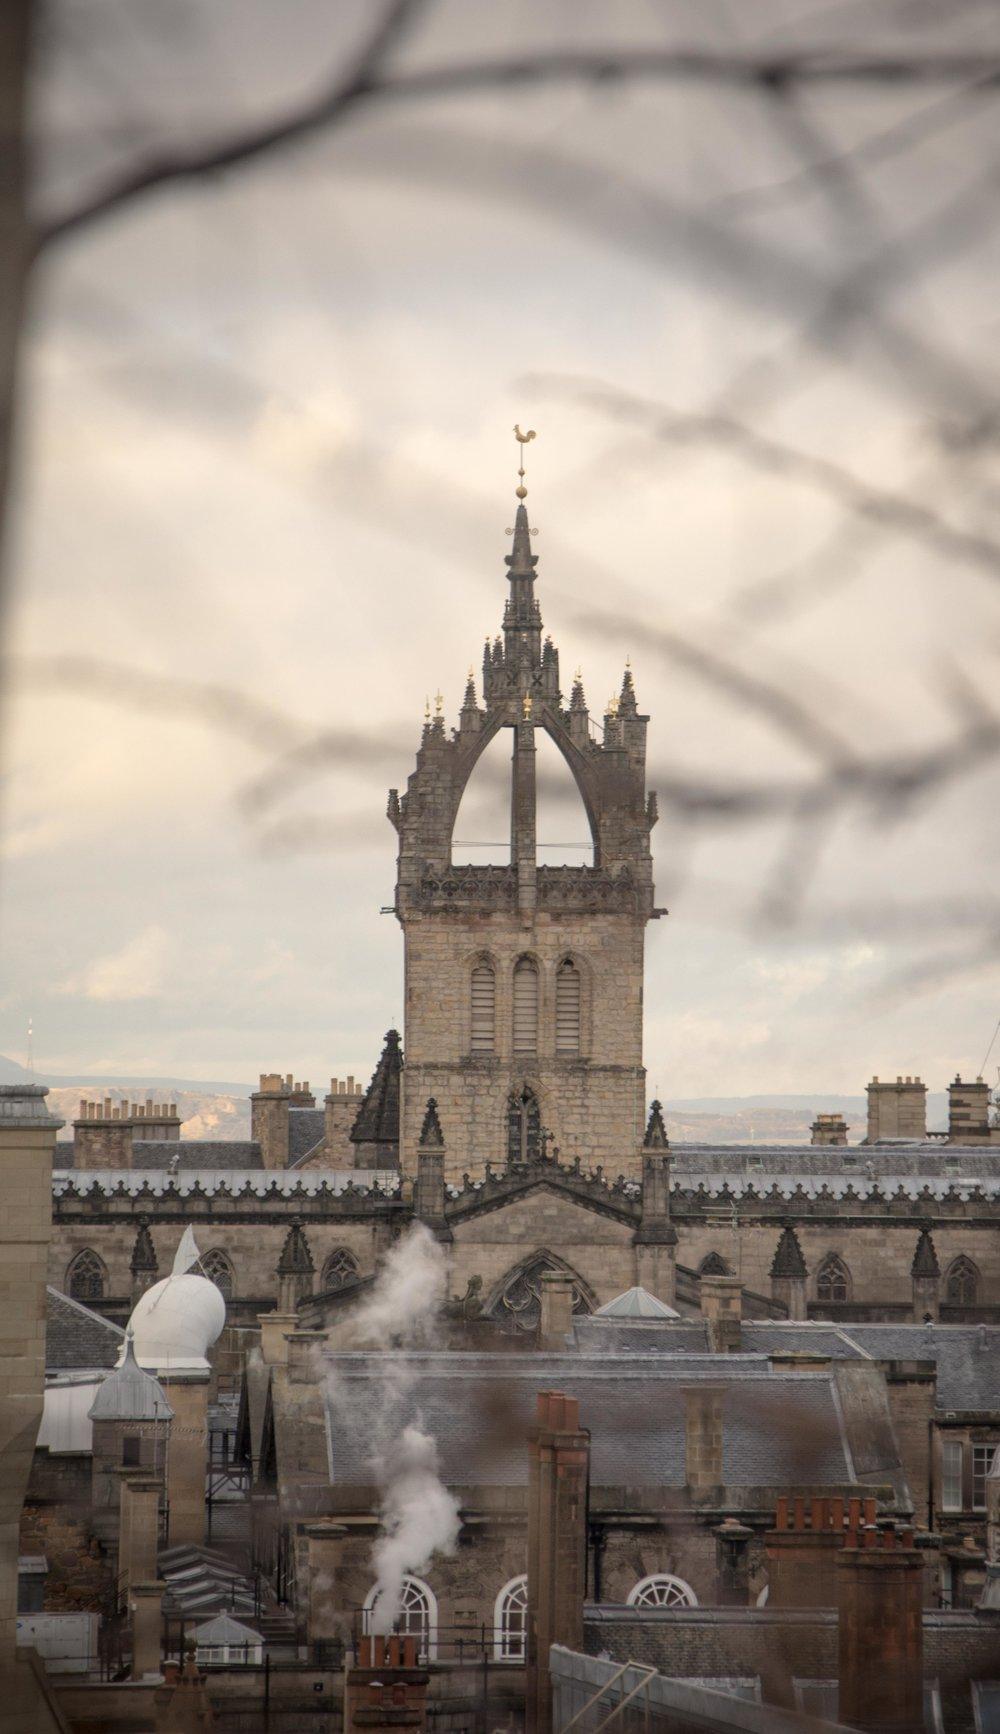 #escocia #edimburgo #scotland #edinburgh #ig_scotland #worldcaptures #worldplaces #alwaysbetraveling #igtravelworld #travel_golds #total_travels #ilovescotland #unlimitededinburgh #scotlandmagazine